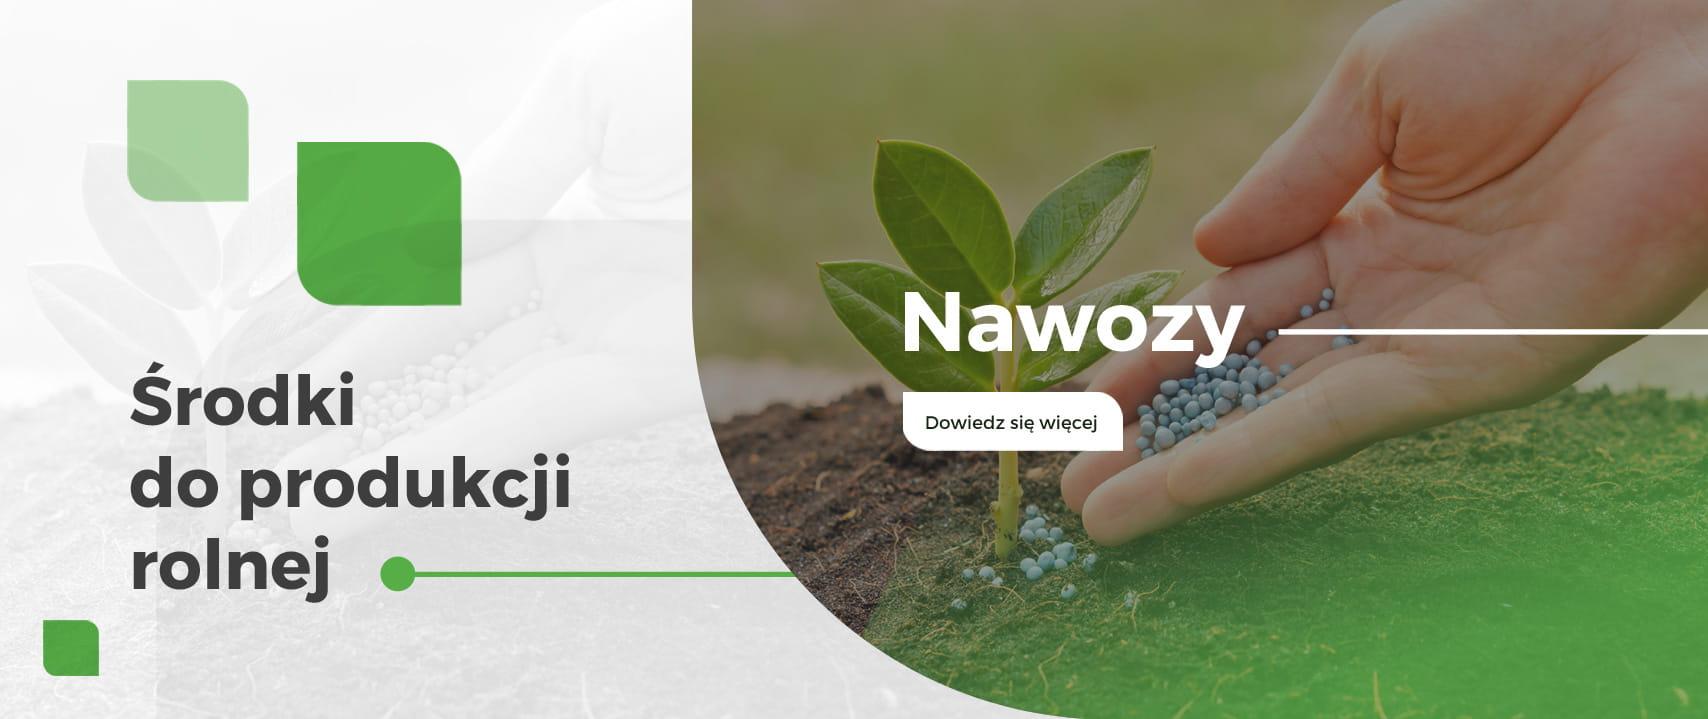 RATBET - Nawozy